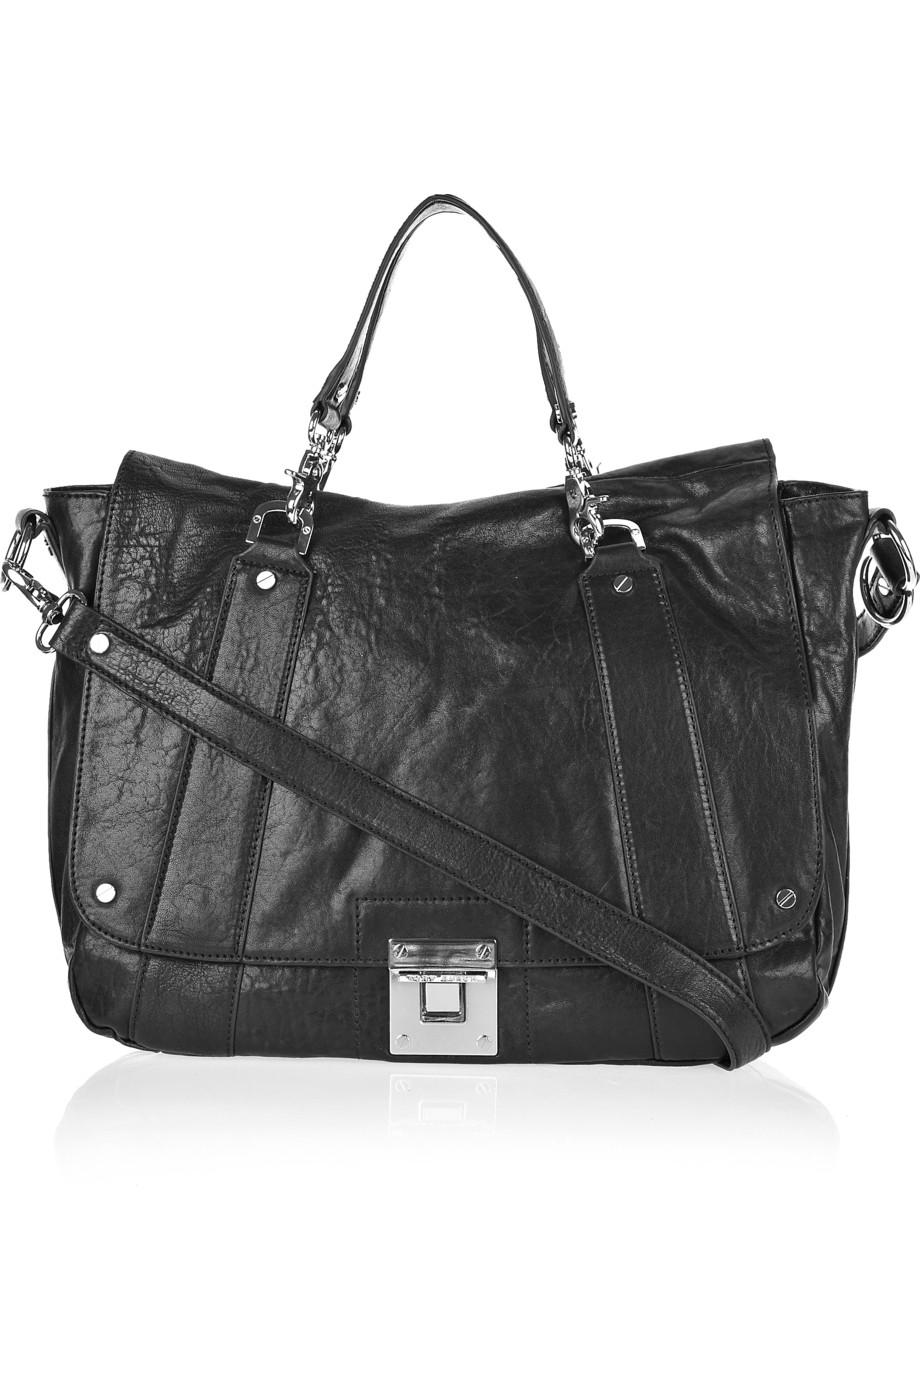 Lyst Tory Burch Dayton Messenger Leather Satchel In Black